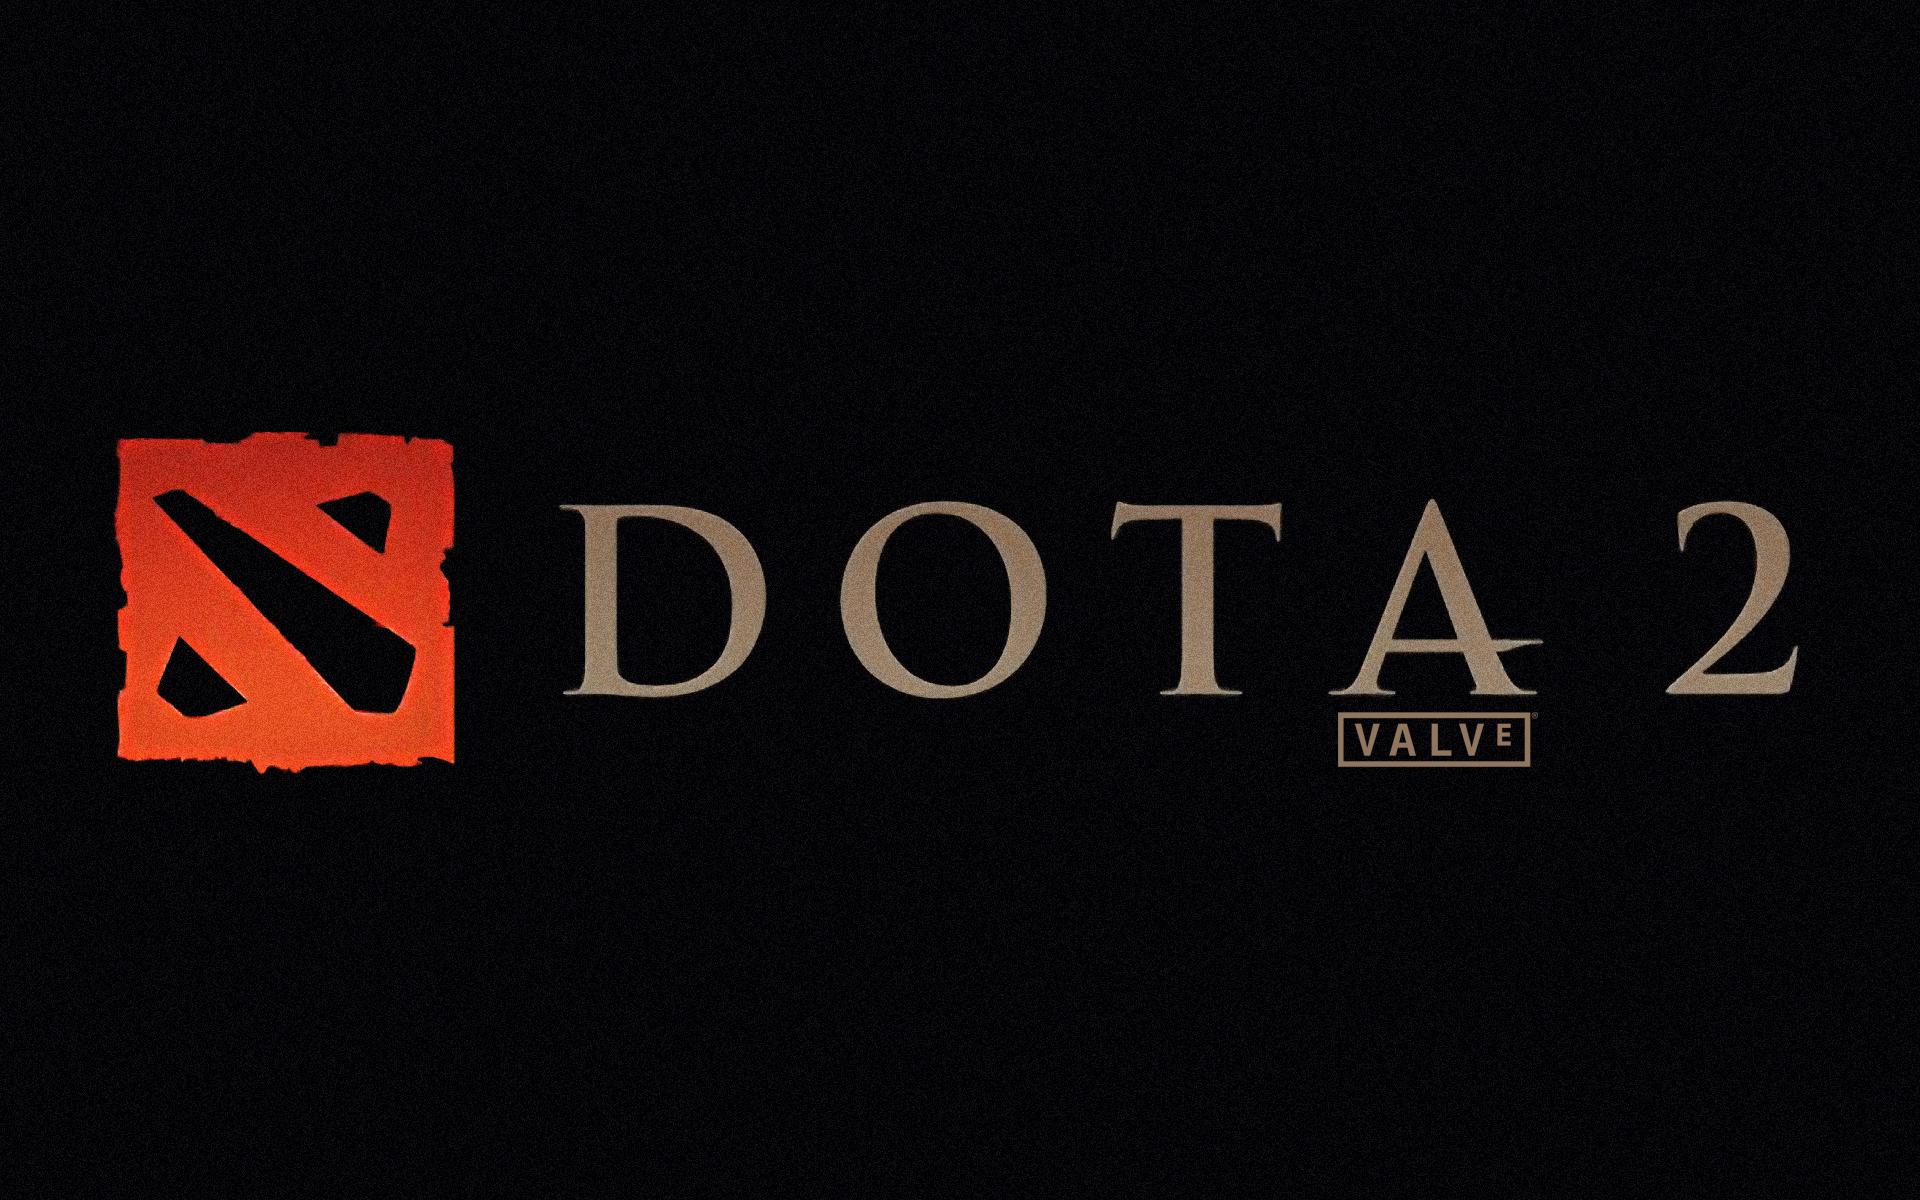 Do 2 Dota 2 Logo Hd Wallpapers Games Picture Wallpaper Dota 2 Less